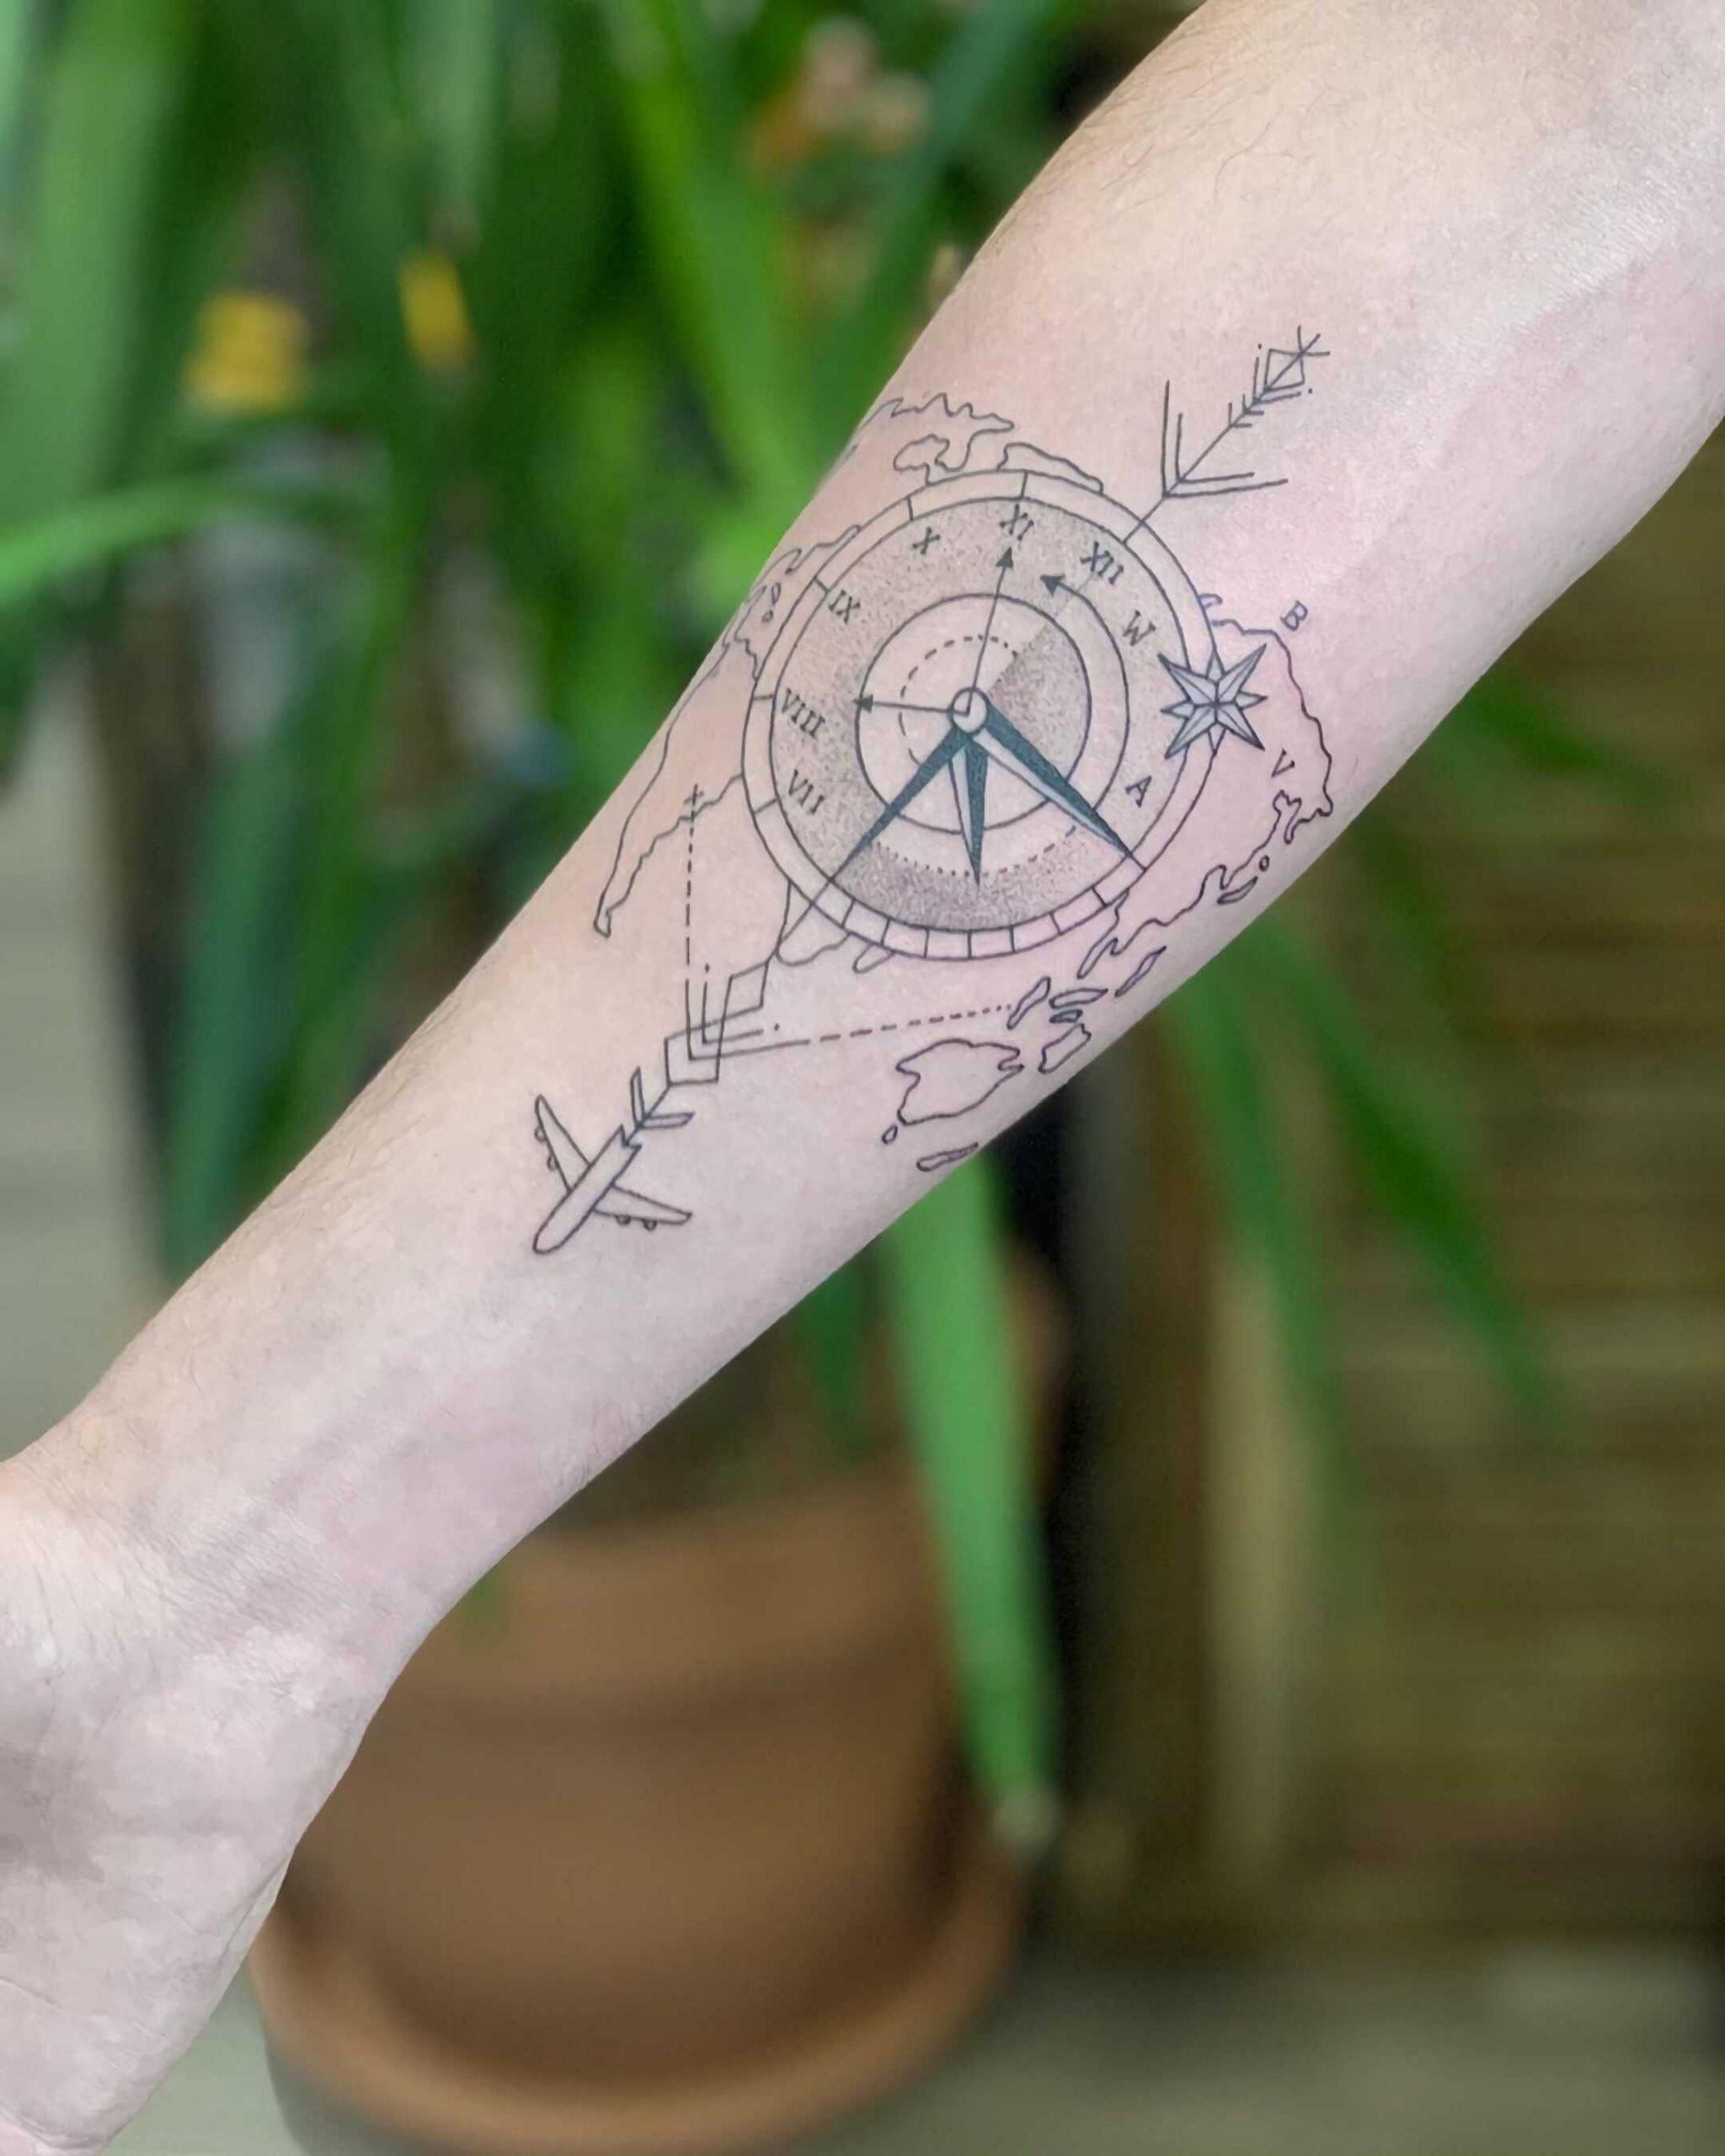 тату компаса на руке в геометрическом стиле